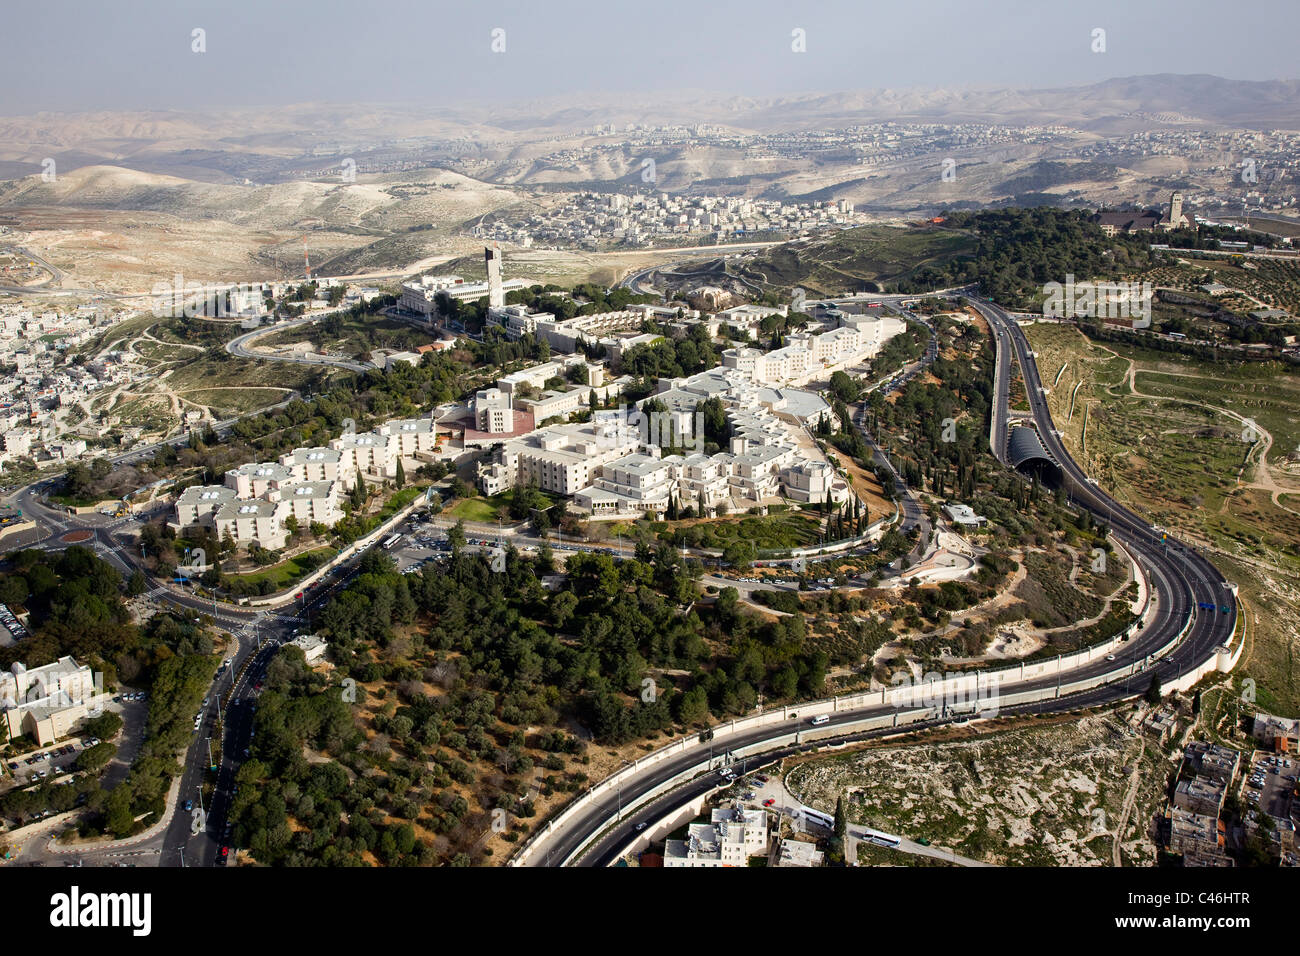 Aerial photograph of the Hebrew University on mount Scopus Jerusalem - Stock Image